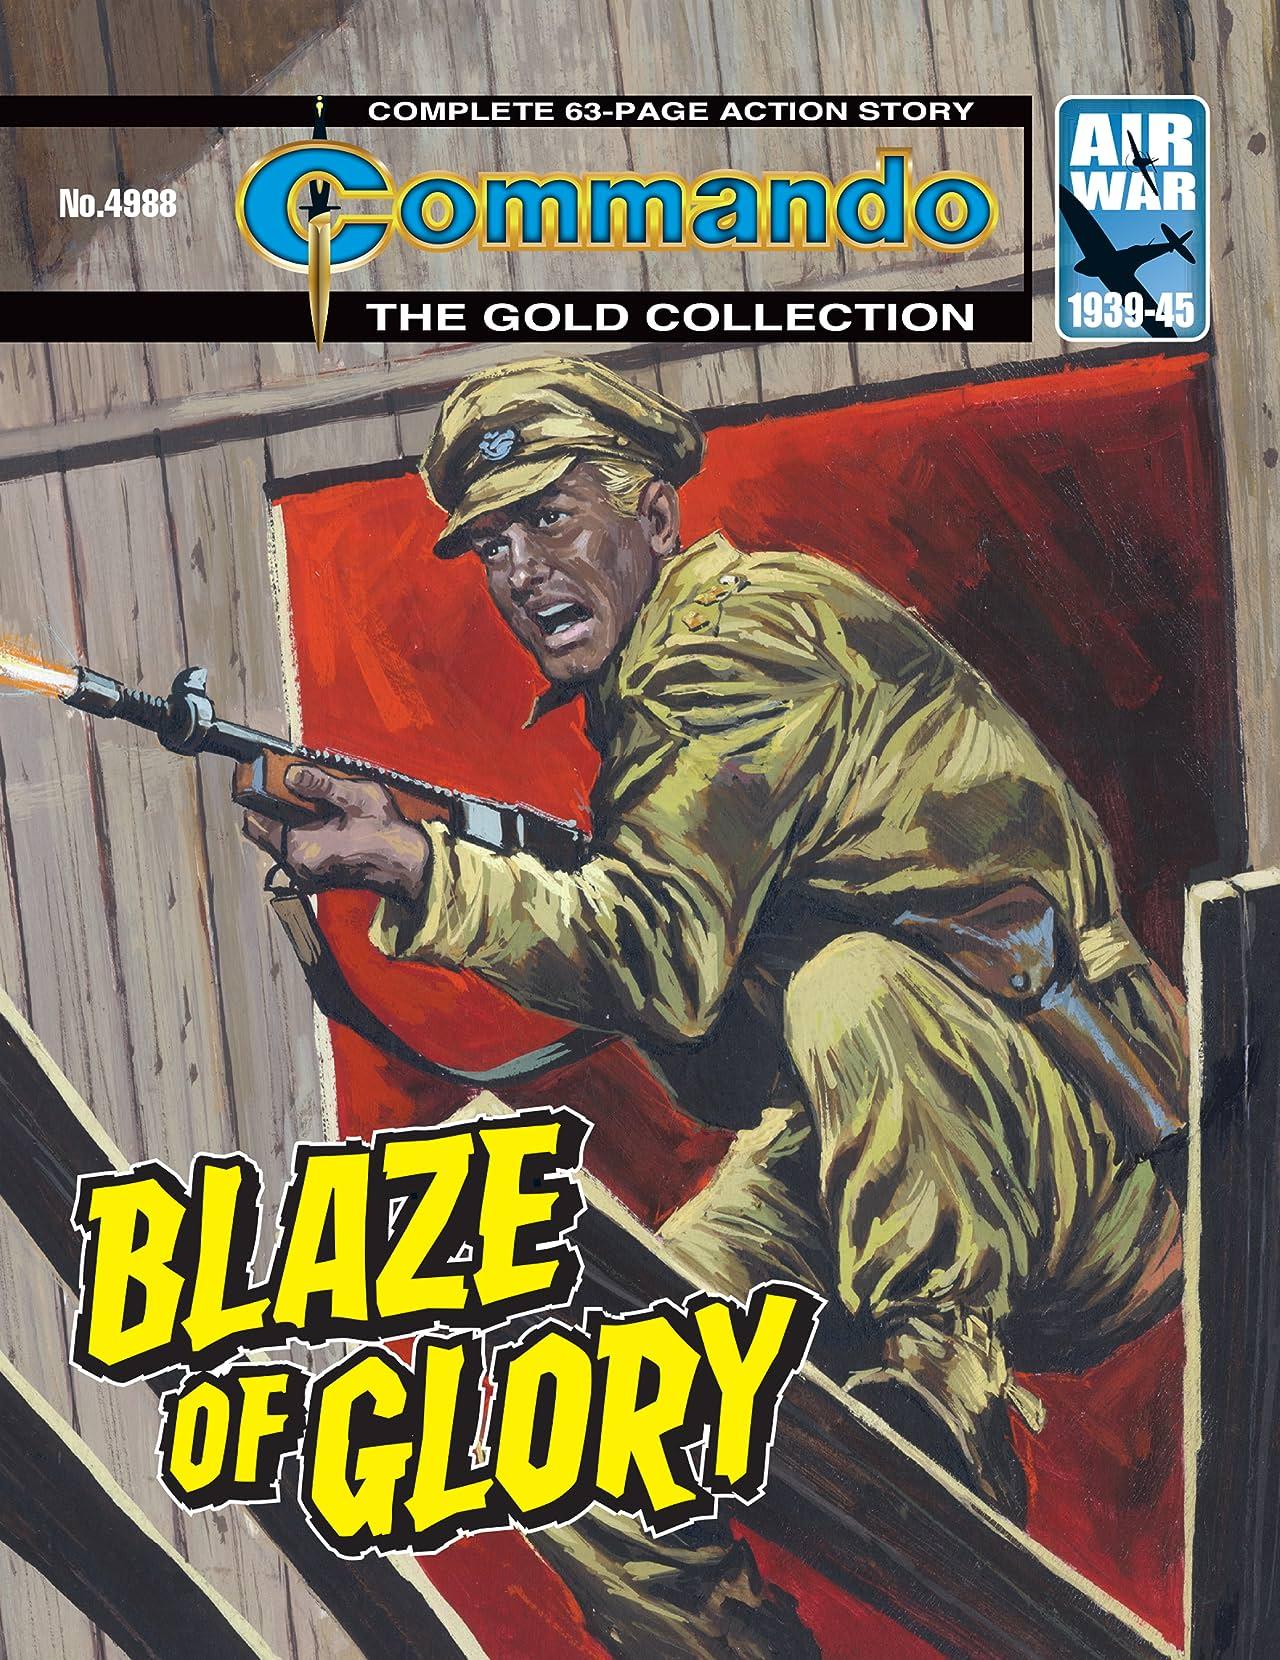 Commando #4988: Blaze Of Glory